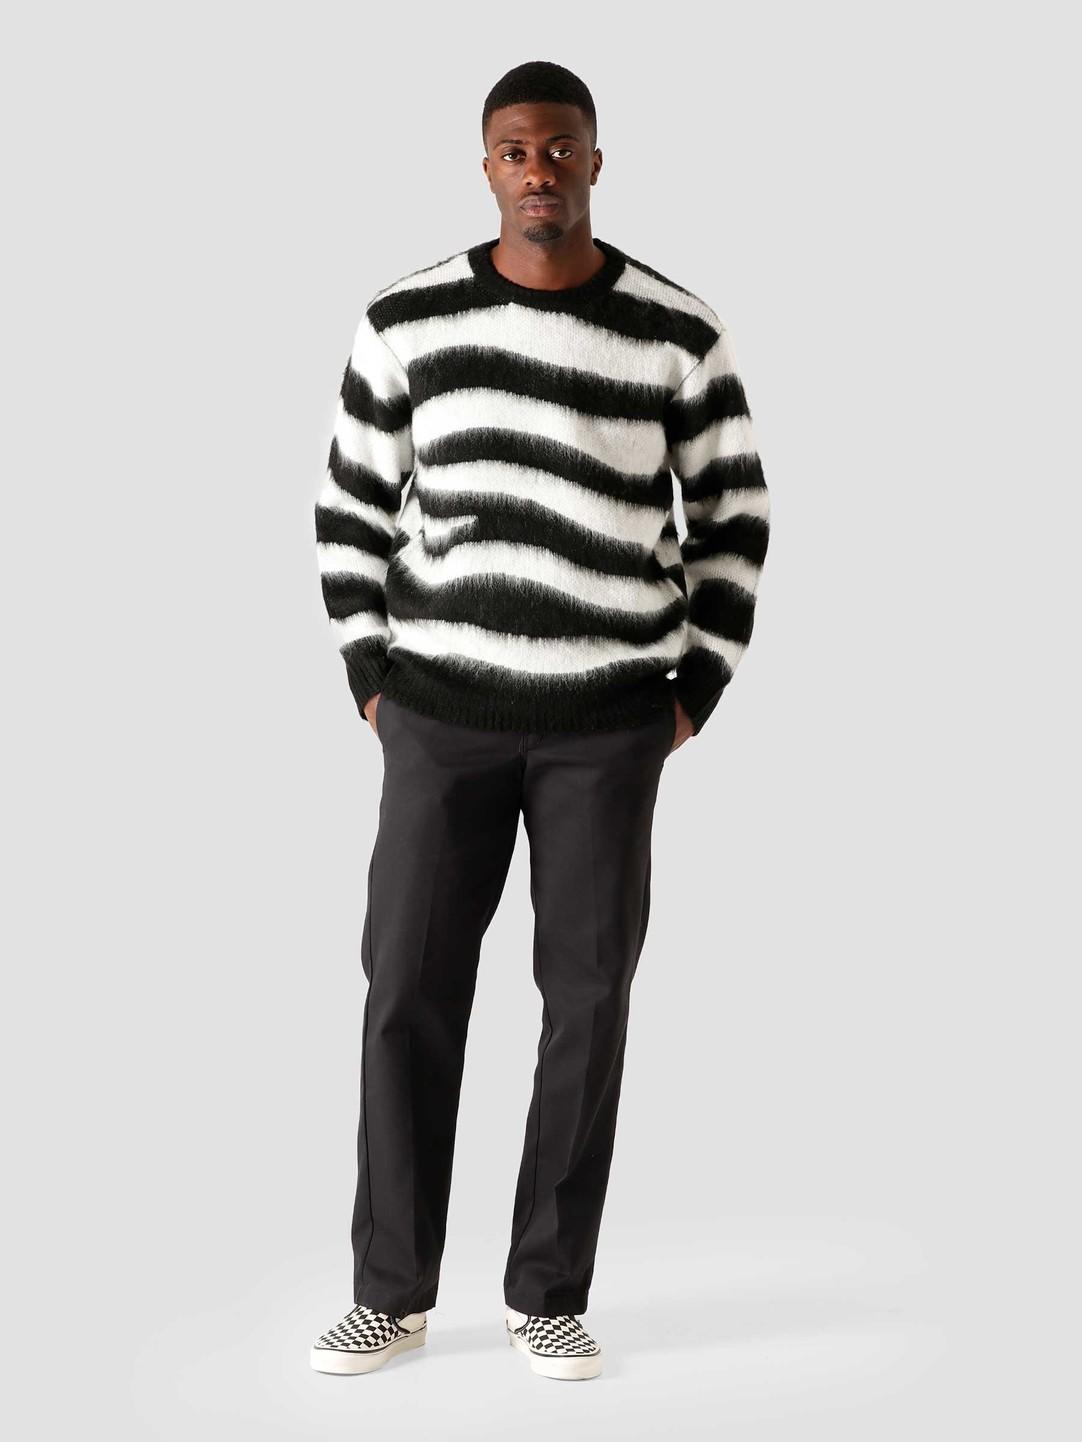 Obey Obey Dream Sweater Black Multi 151000044BKM